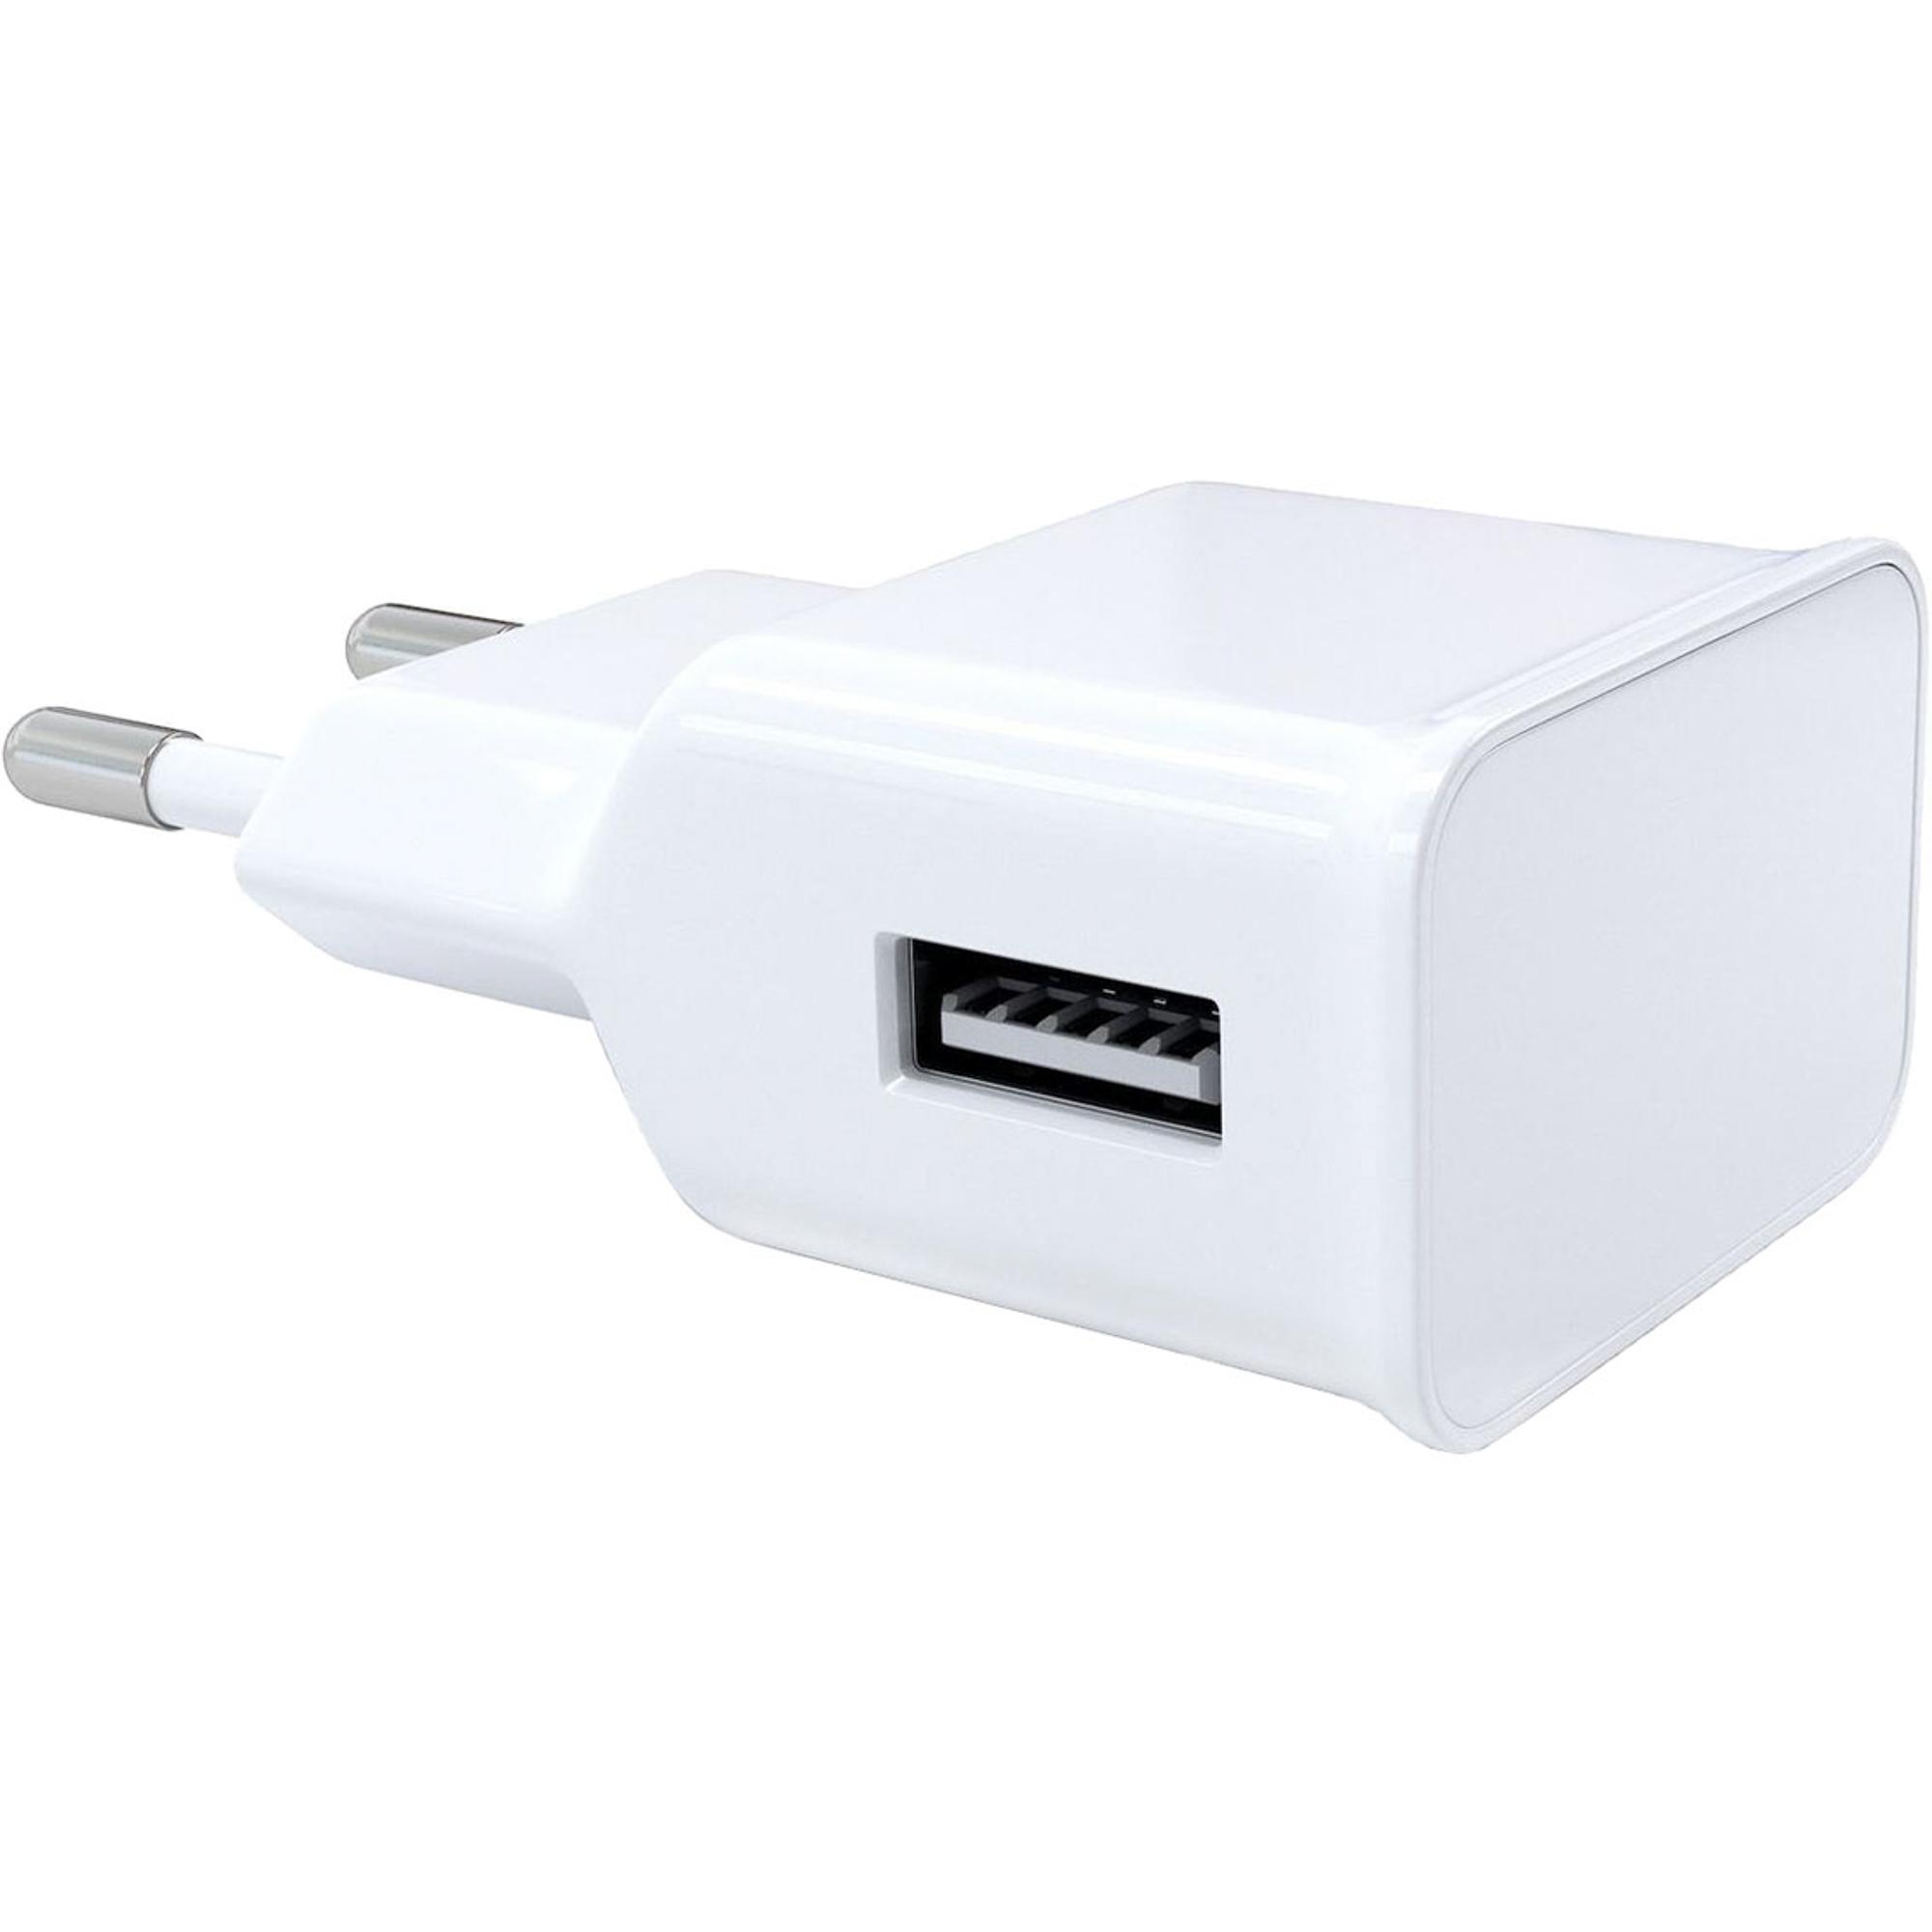 Фото - Сетевое зарядное устройство Red Line NT-1A 1 USB белый biostal nt 1200 1 2 л